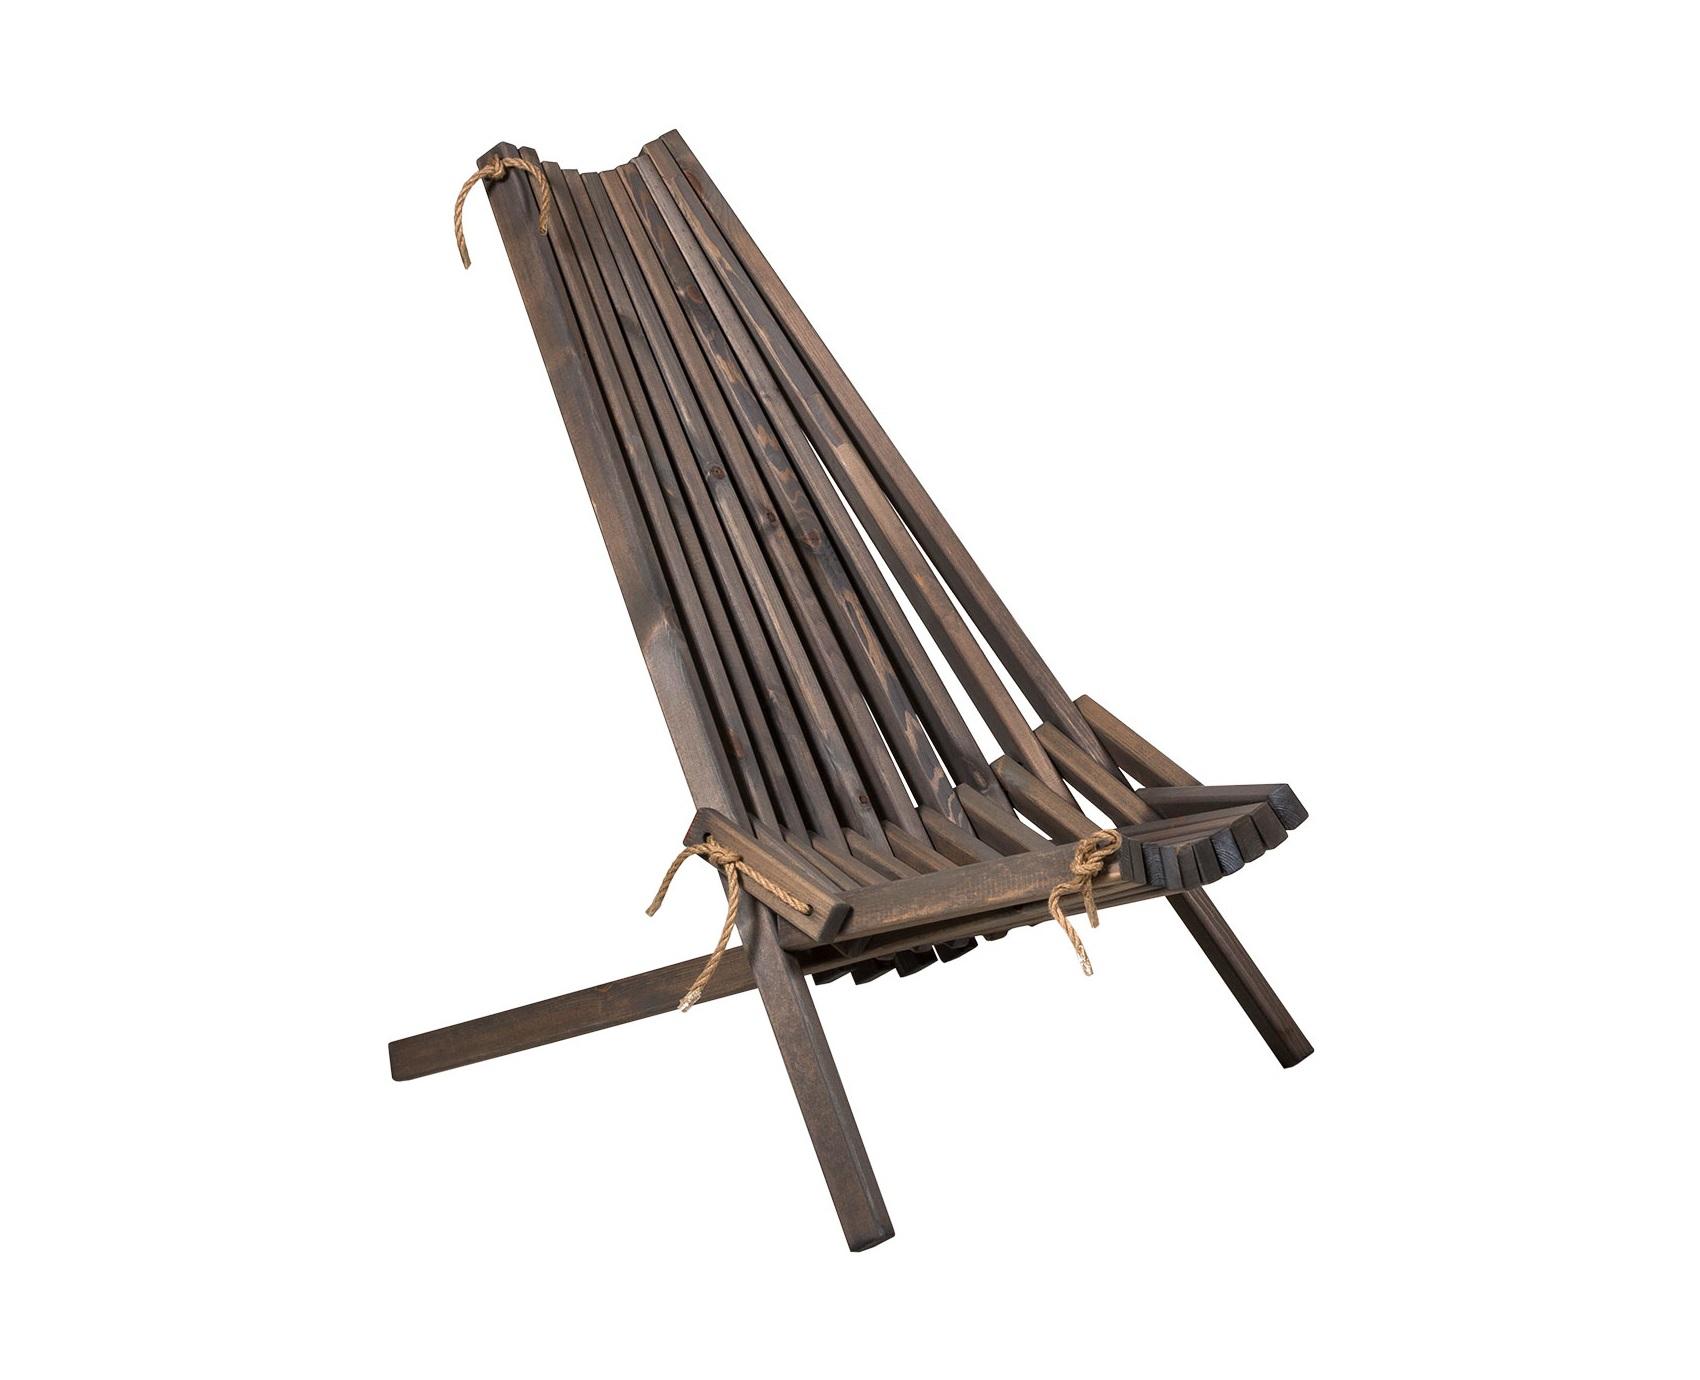 Кресло для отдыха CalcuttaКресла для сада<br><br><br>Material: Сосна<br>Length см: None<br>Width см: 80<br>Depth см: 60<br>Height см: 82